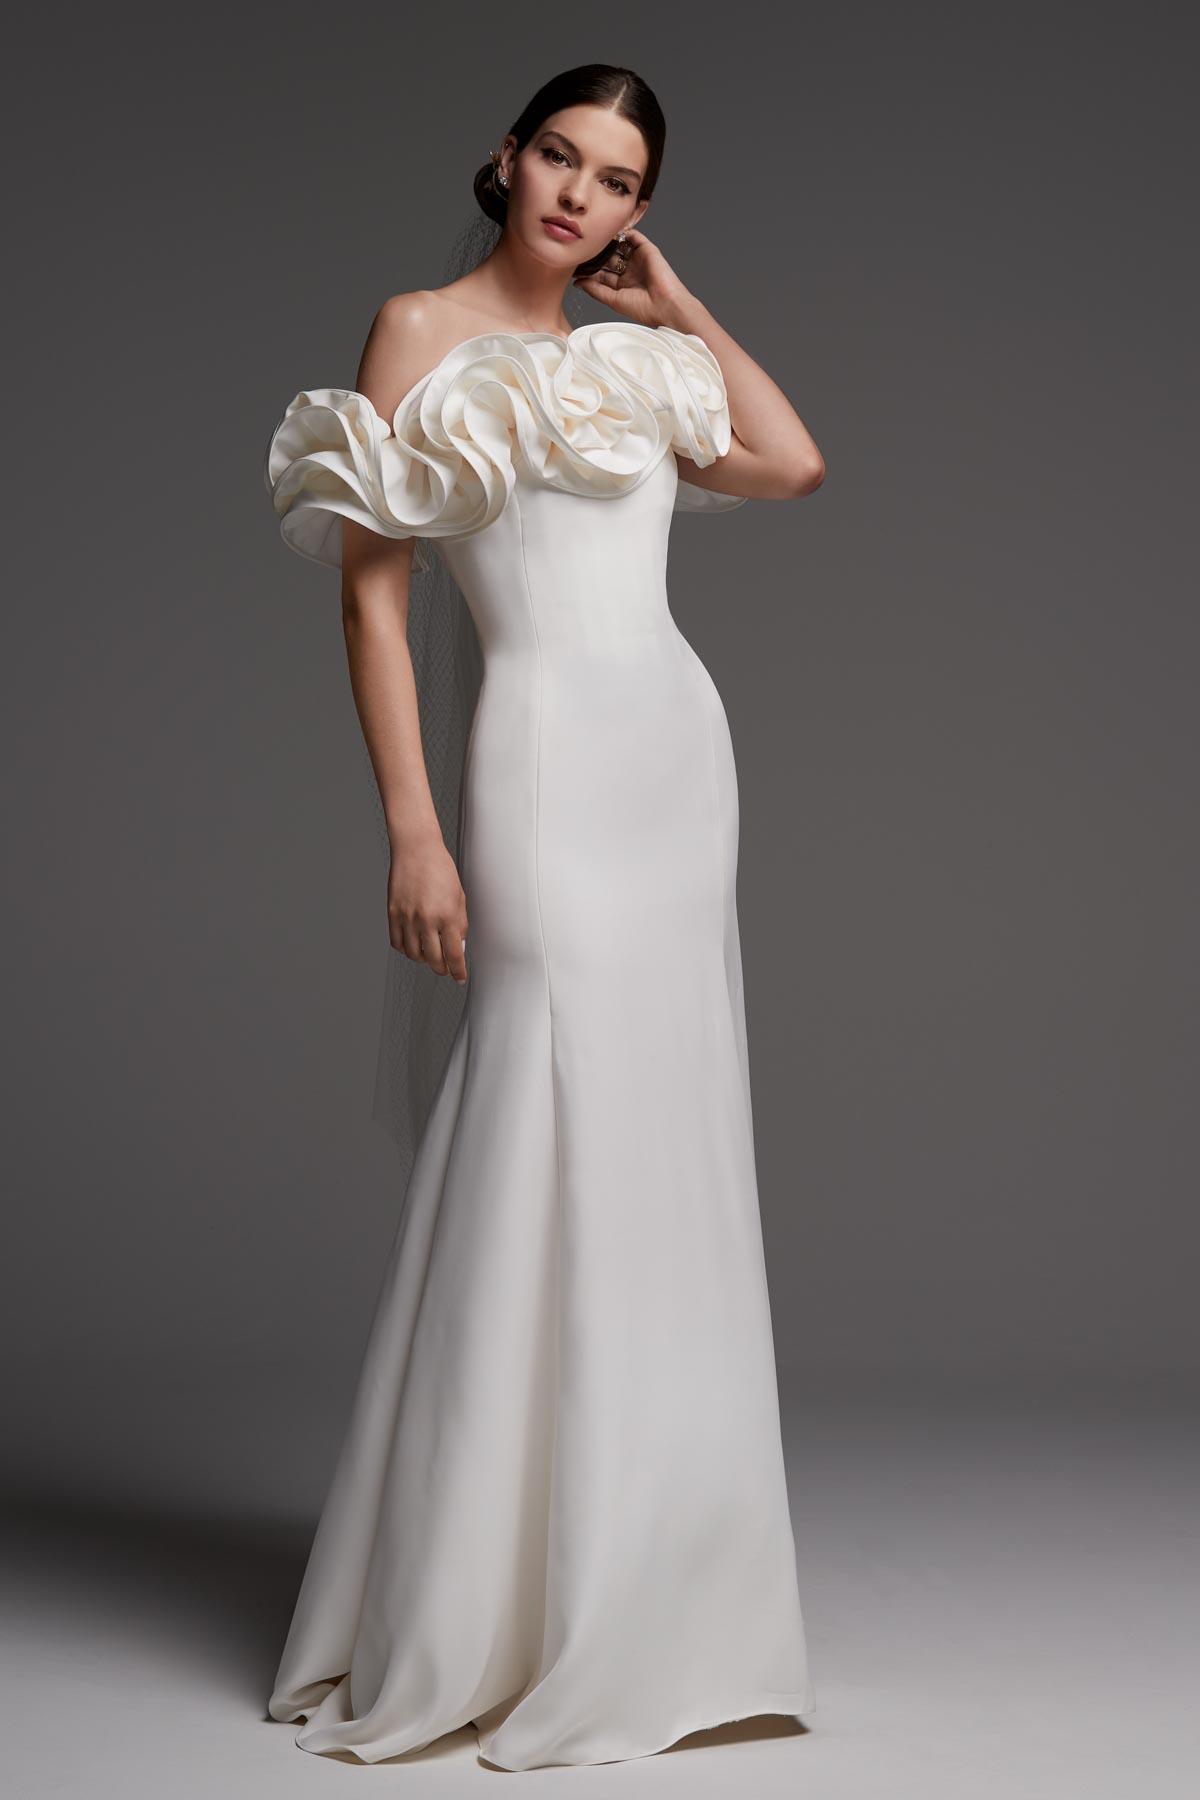 Off-Shoulder Mermaid Wedding Dress   Bycouturier